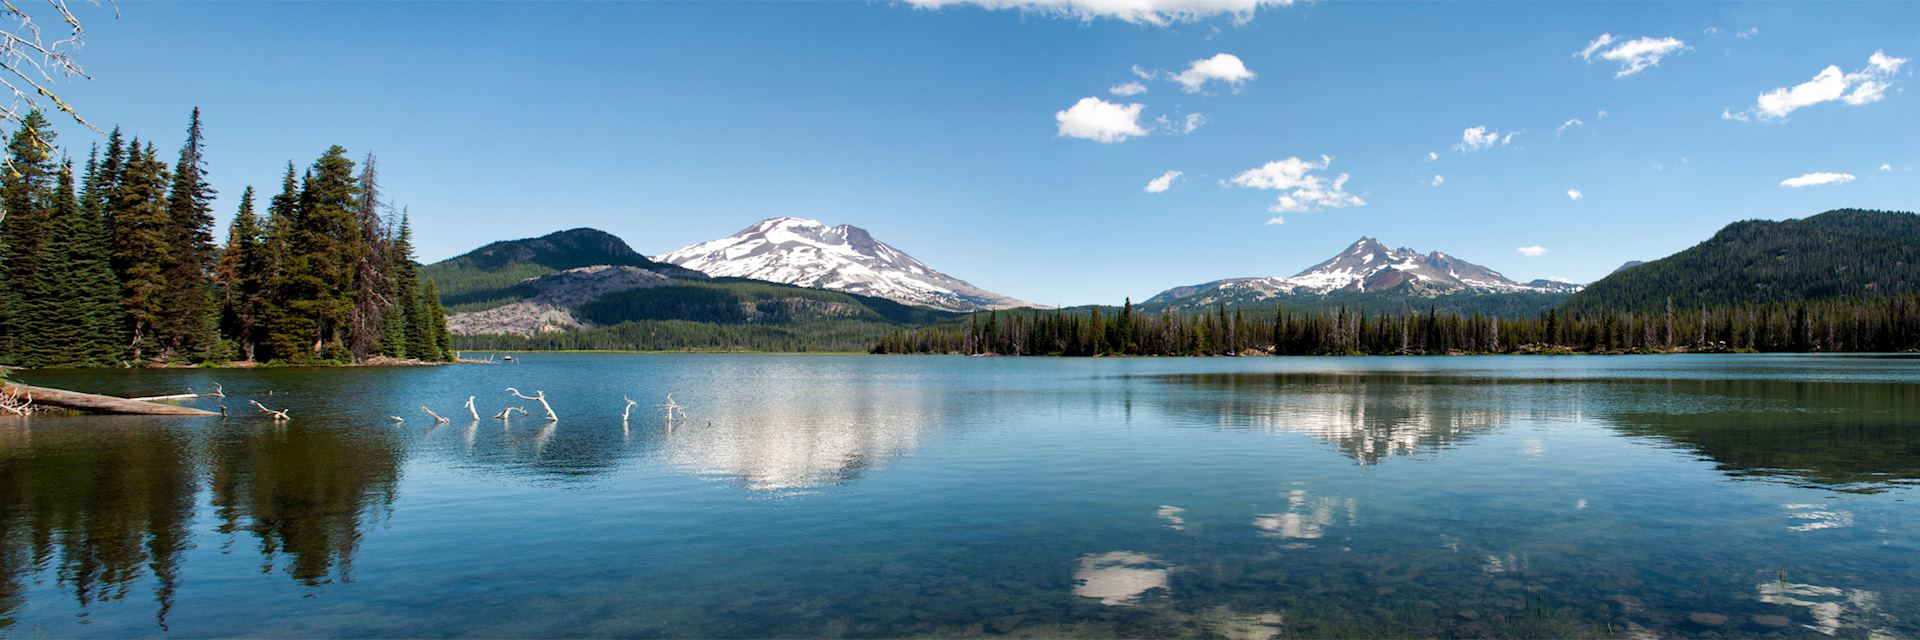 Cascade Lakes in Bend, Oregon